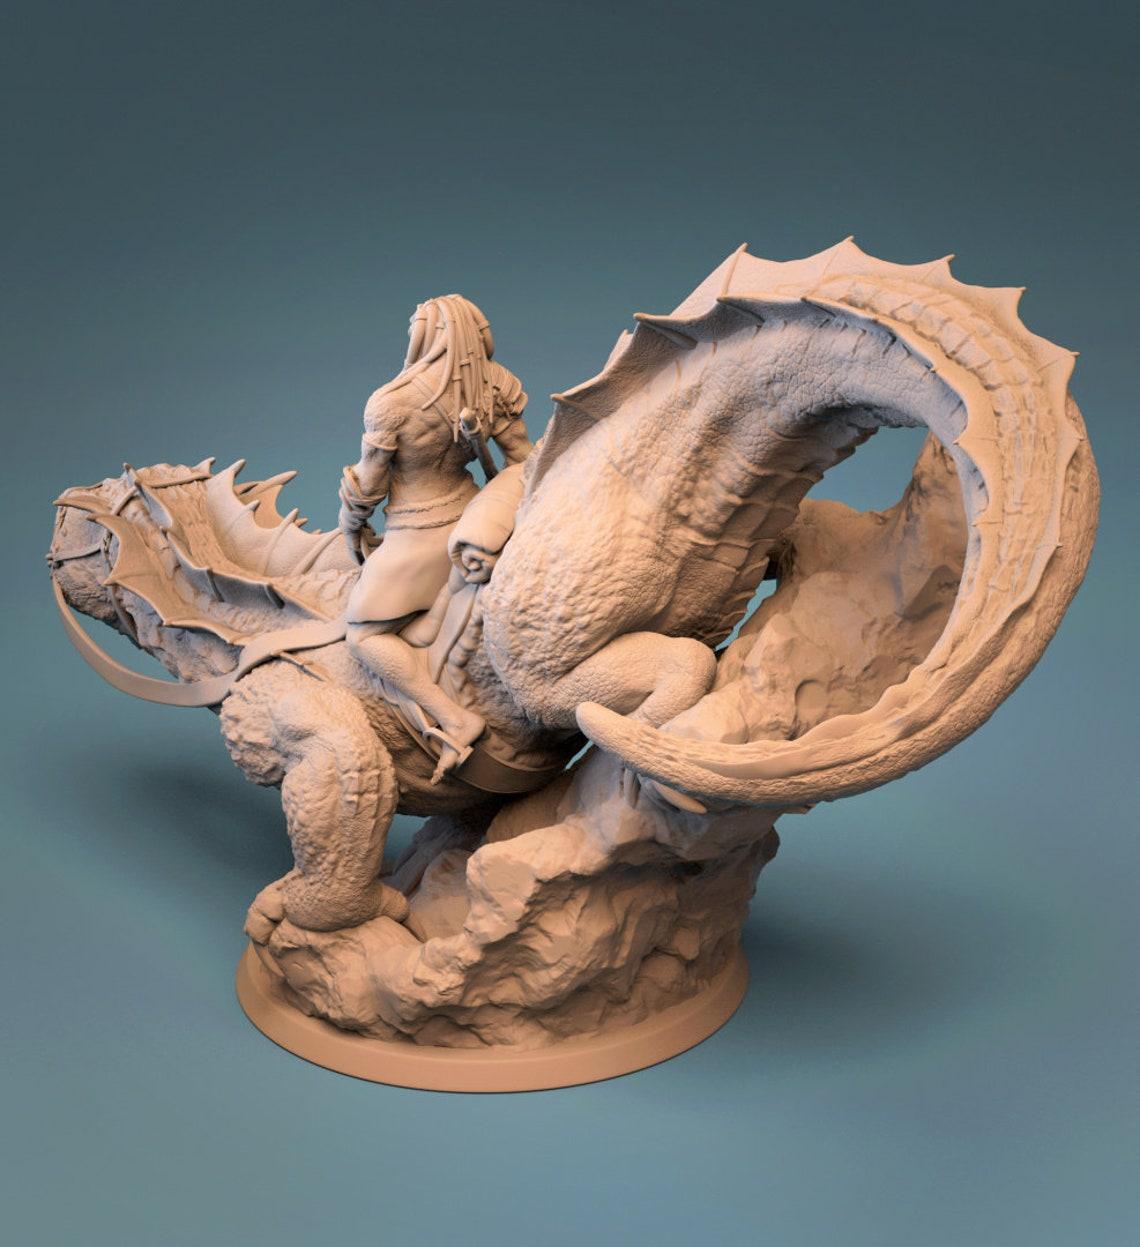 Giant Lizard High Detail Miniatuur Hars 3D-geprinte | Etsy